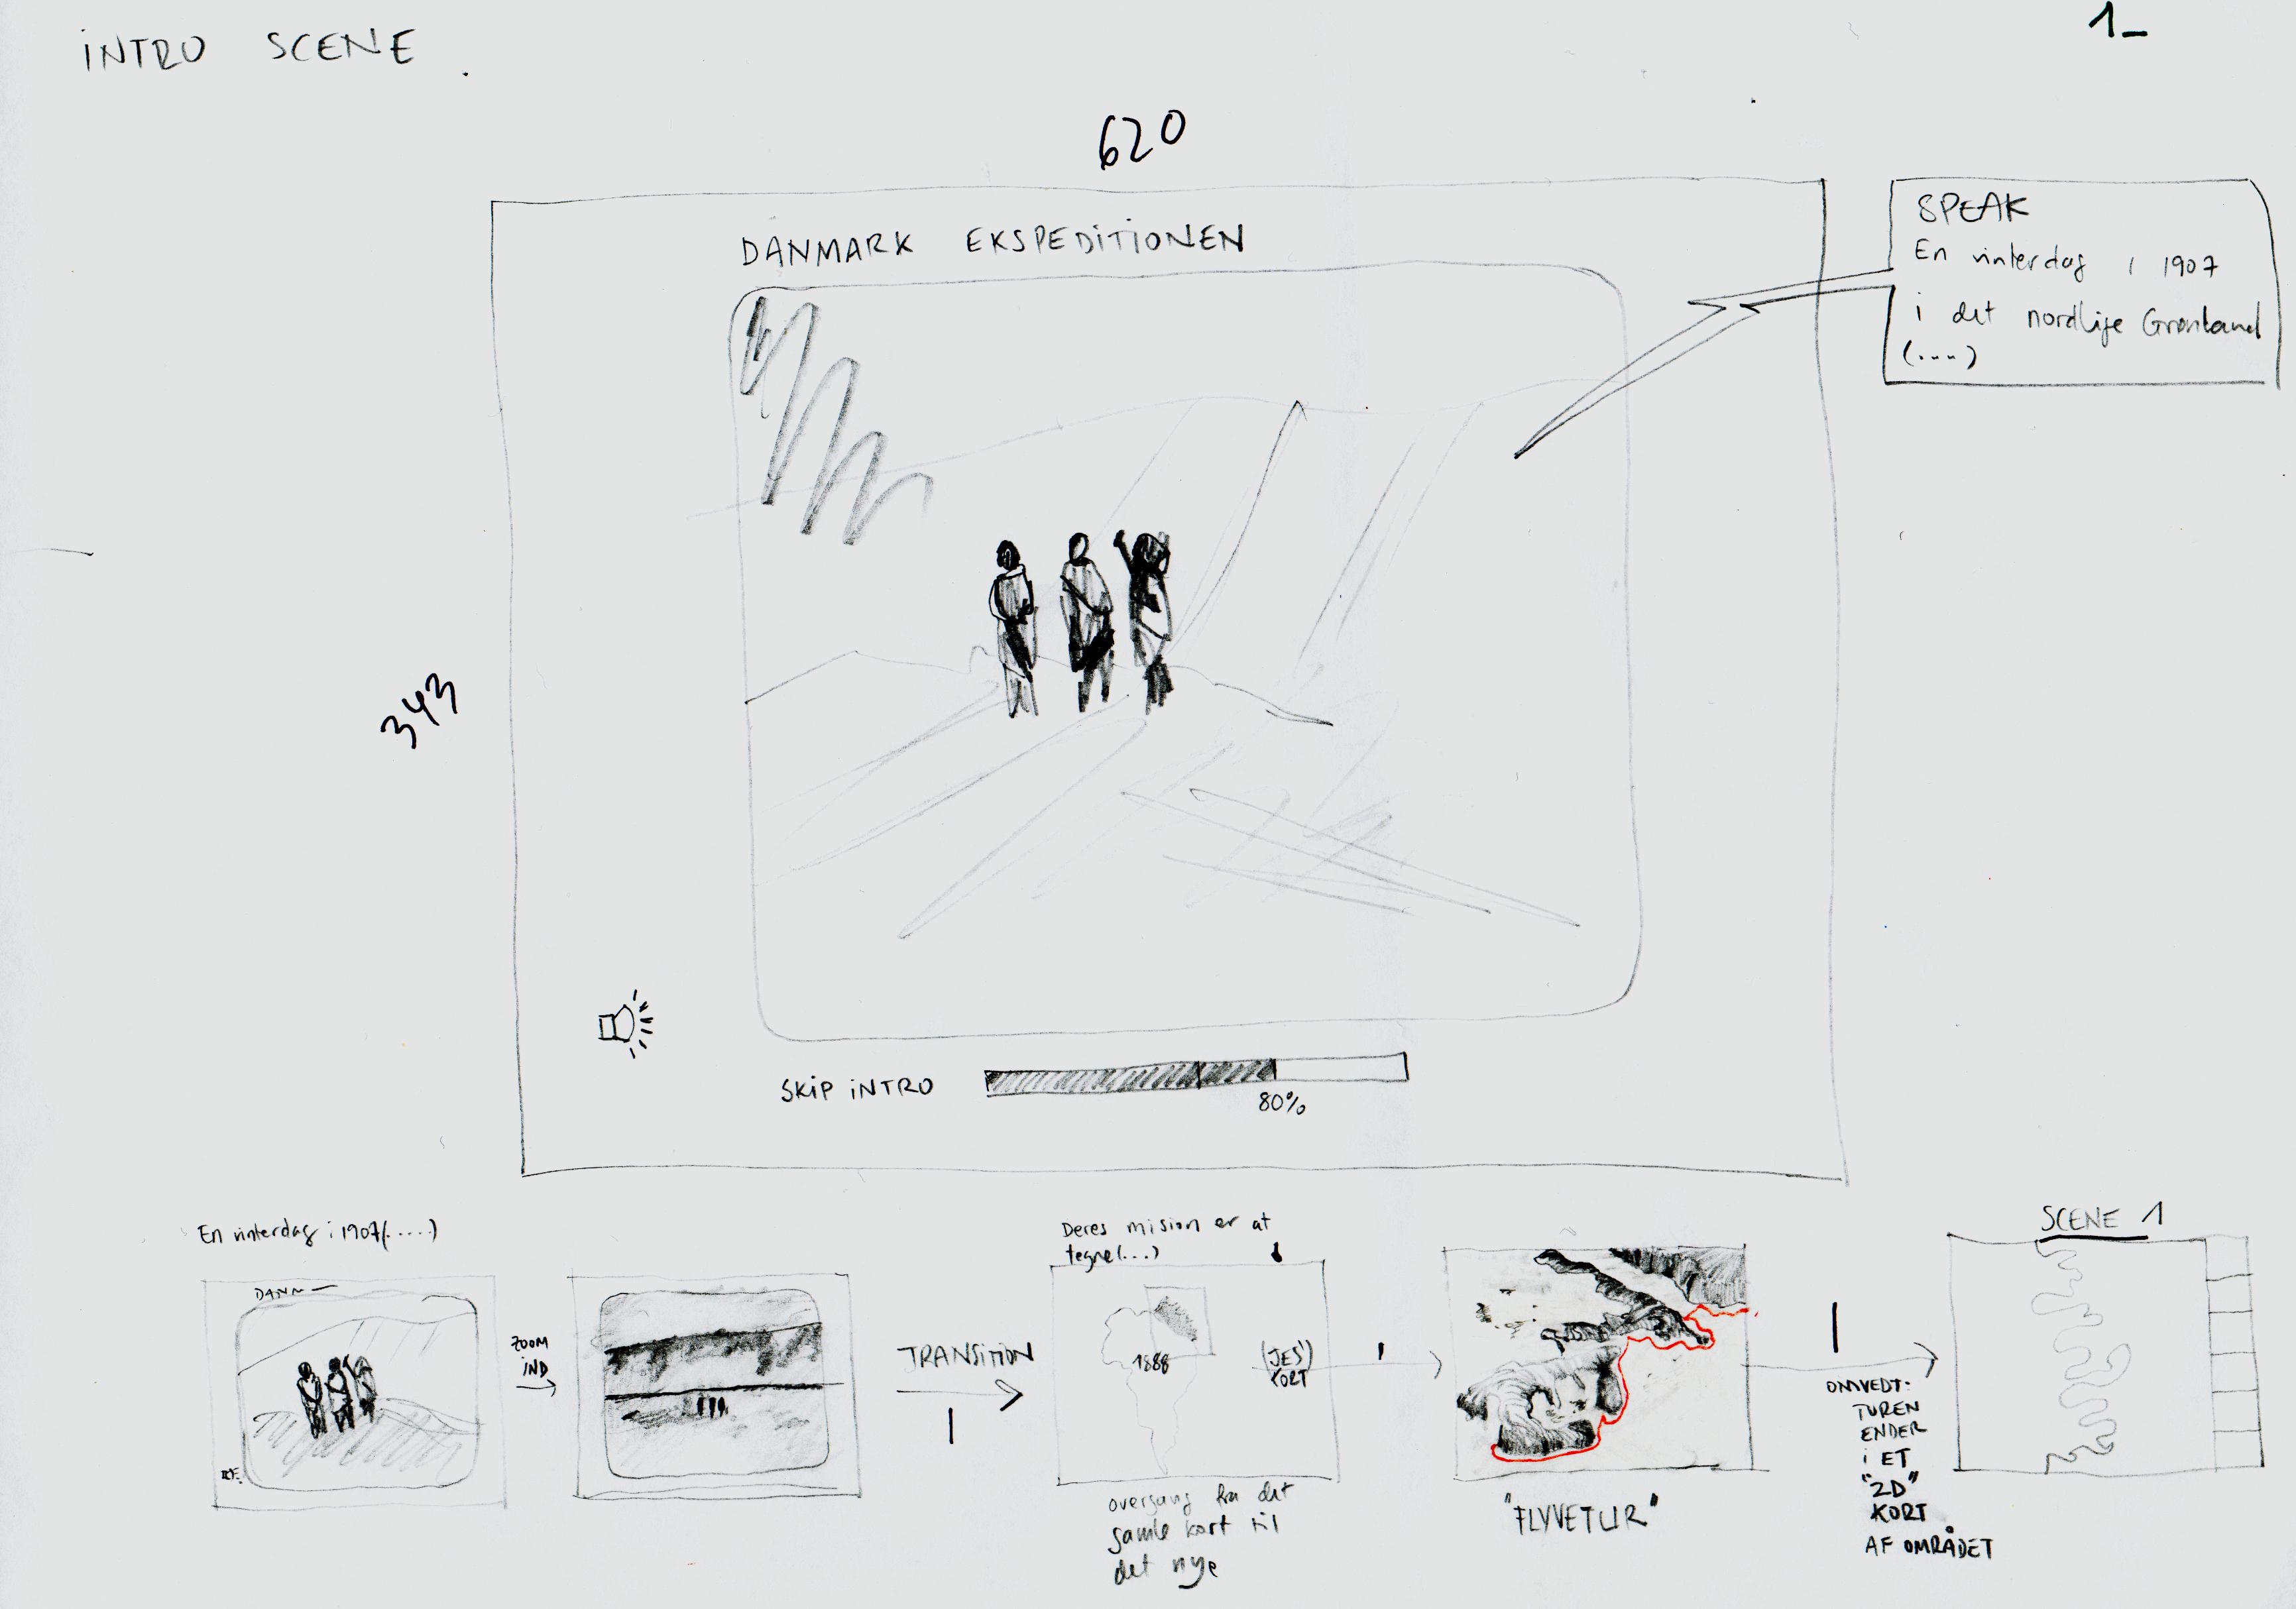 Storyboard til DRs Danmark Ekspeditionen 1